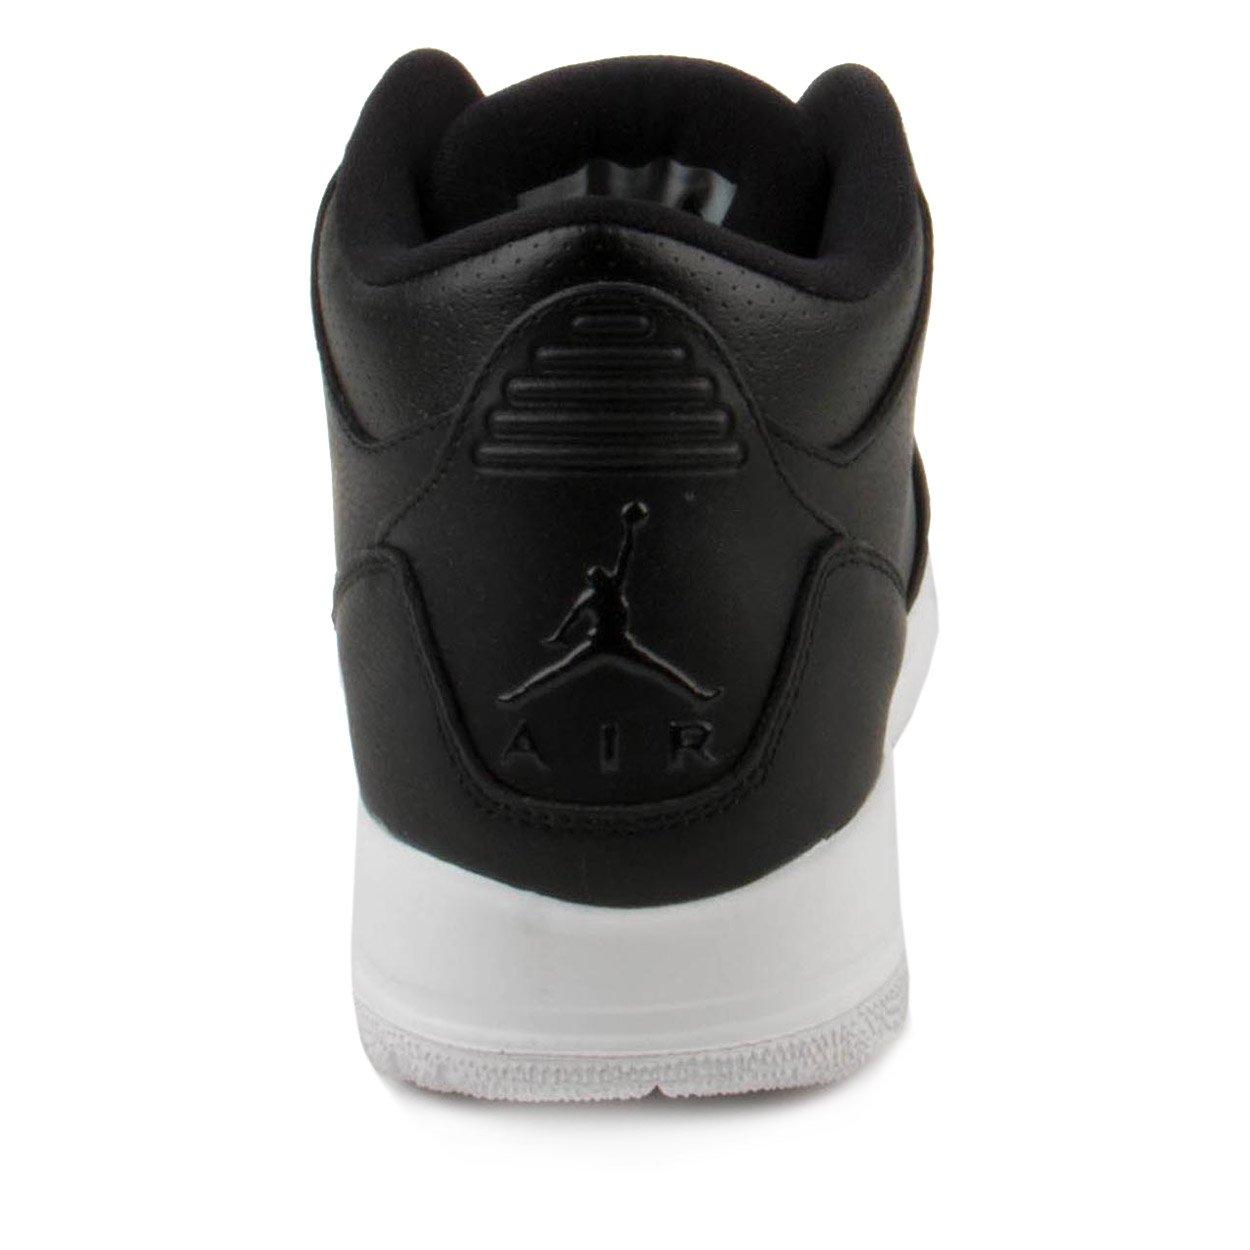 NIKE Jordan Air 3 Retro Bg Boys Basketball Shoes (7Y, Black/Black/White) by Jordan (Image #4)